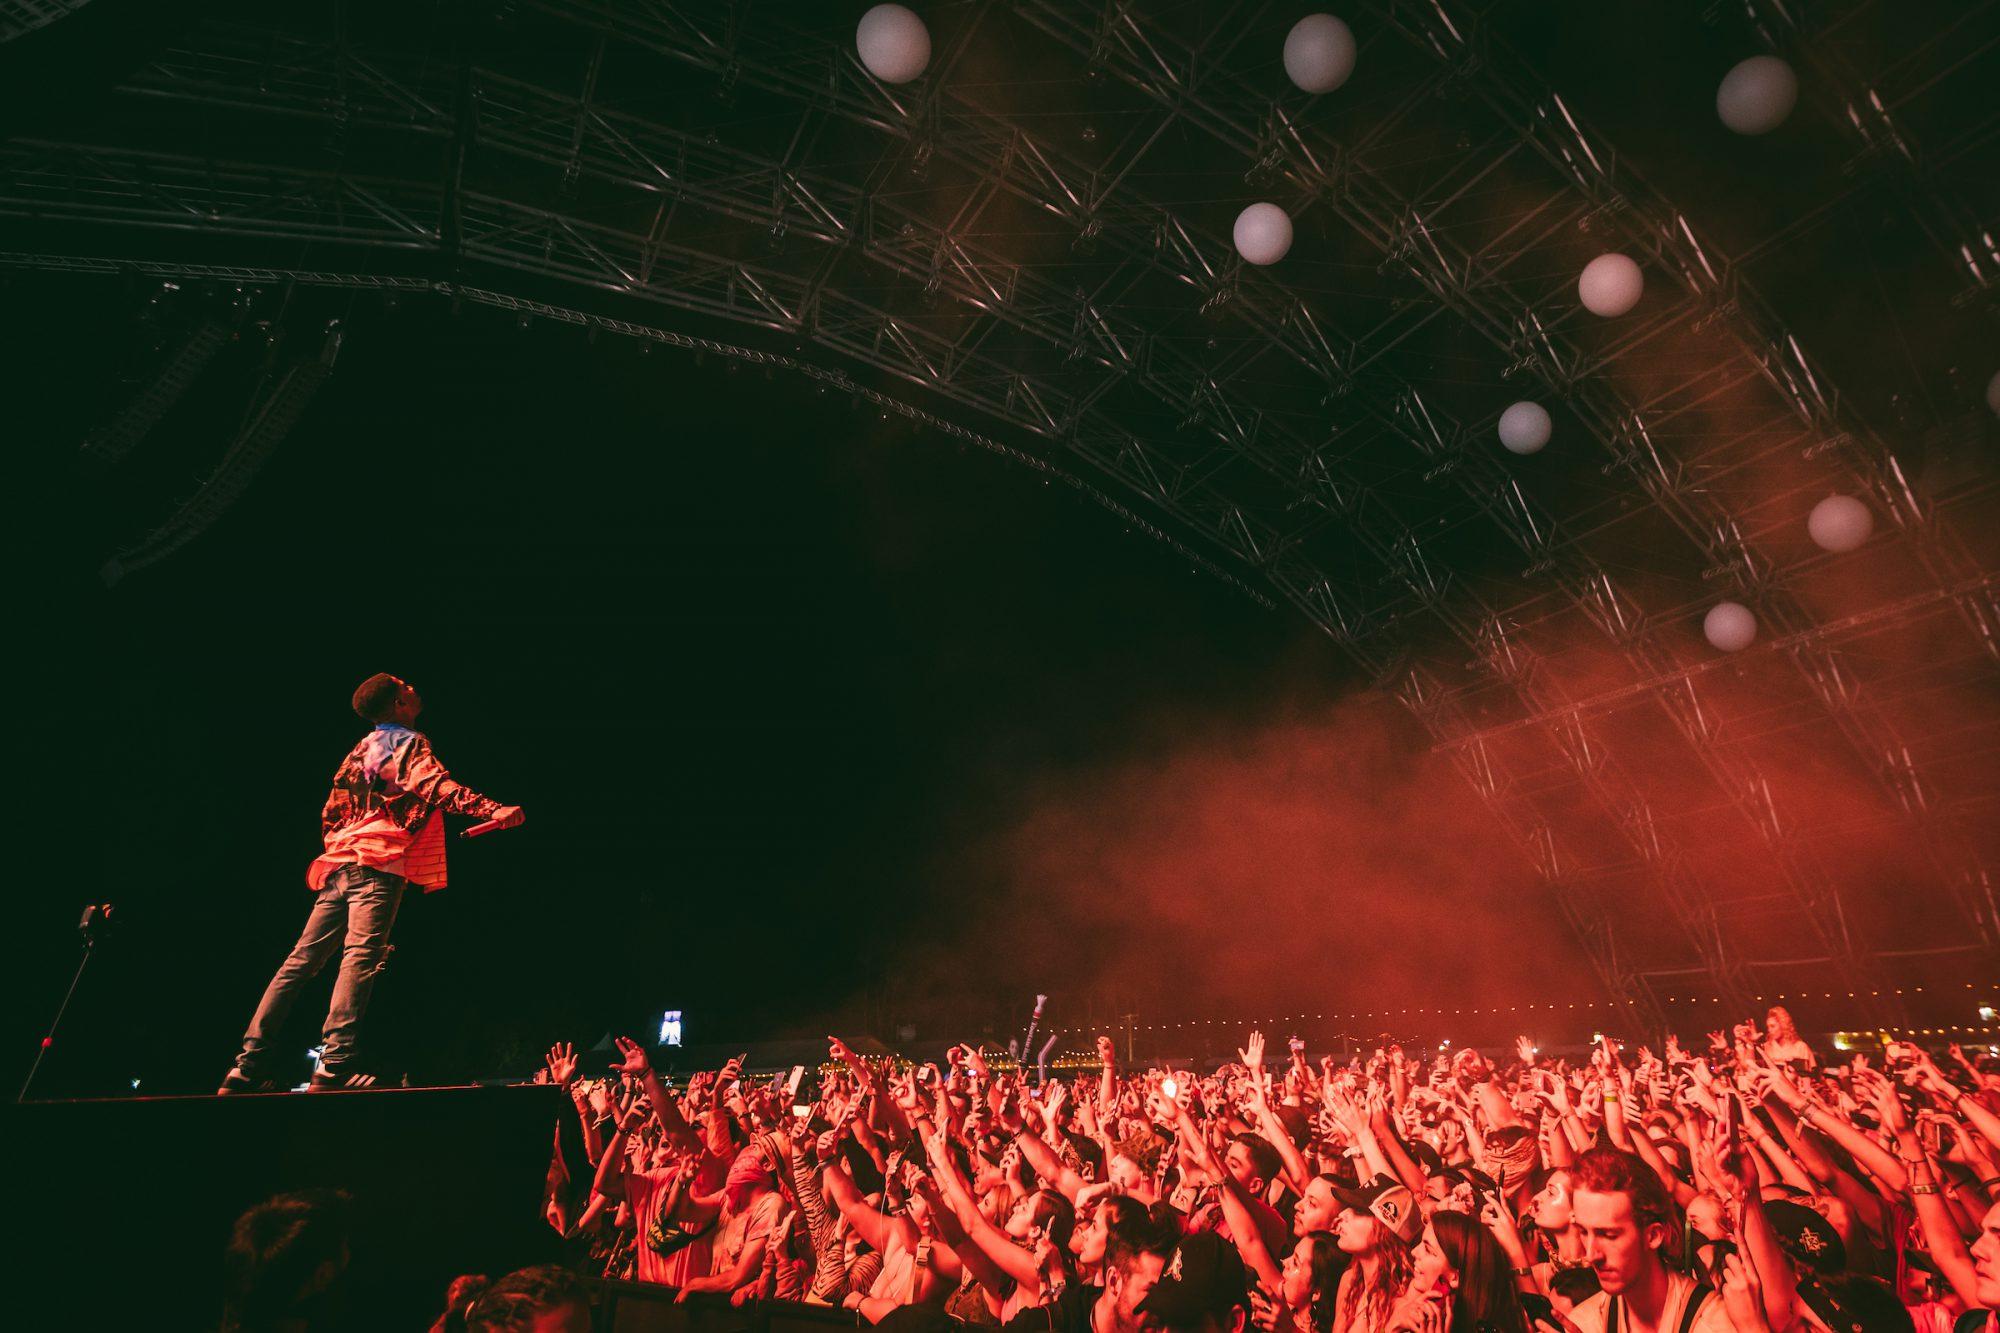 Kid Cudi, Coachella 2019 Weekend 1, Sahara Tent, Saturday